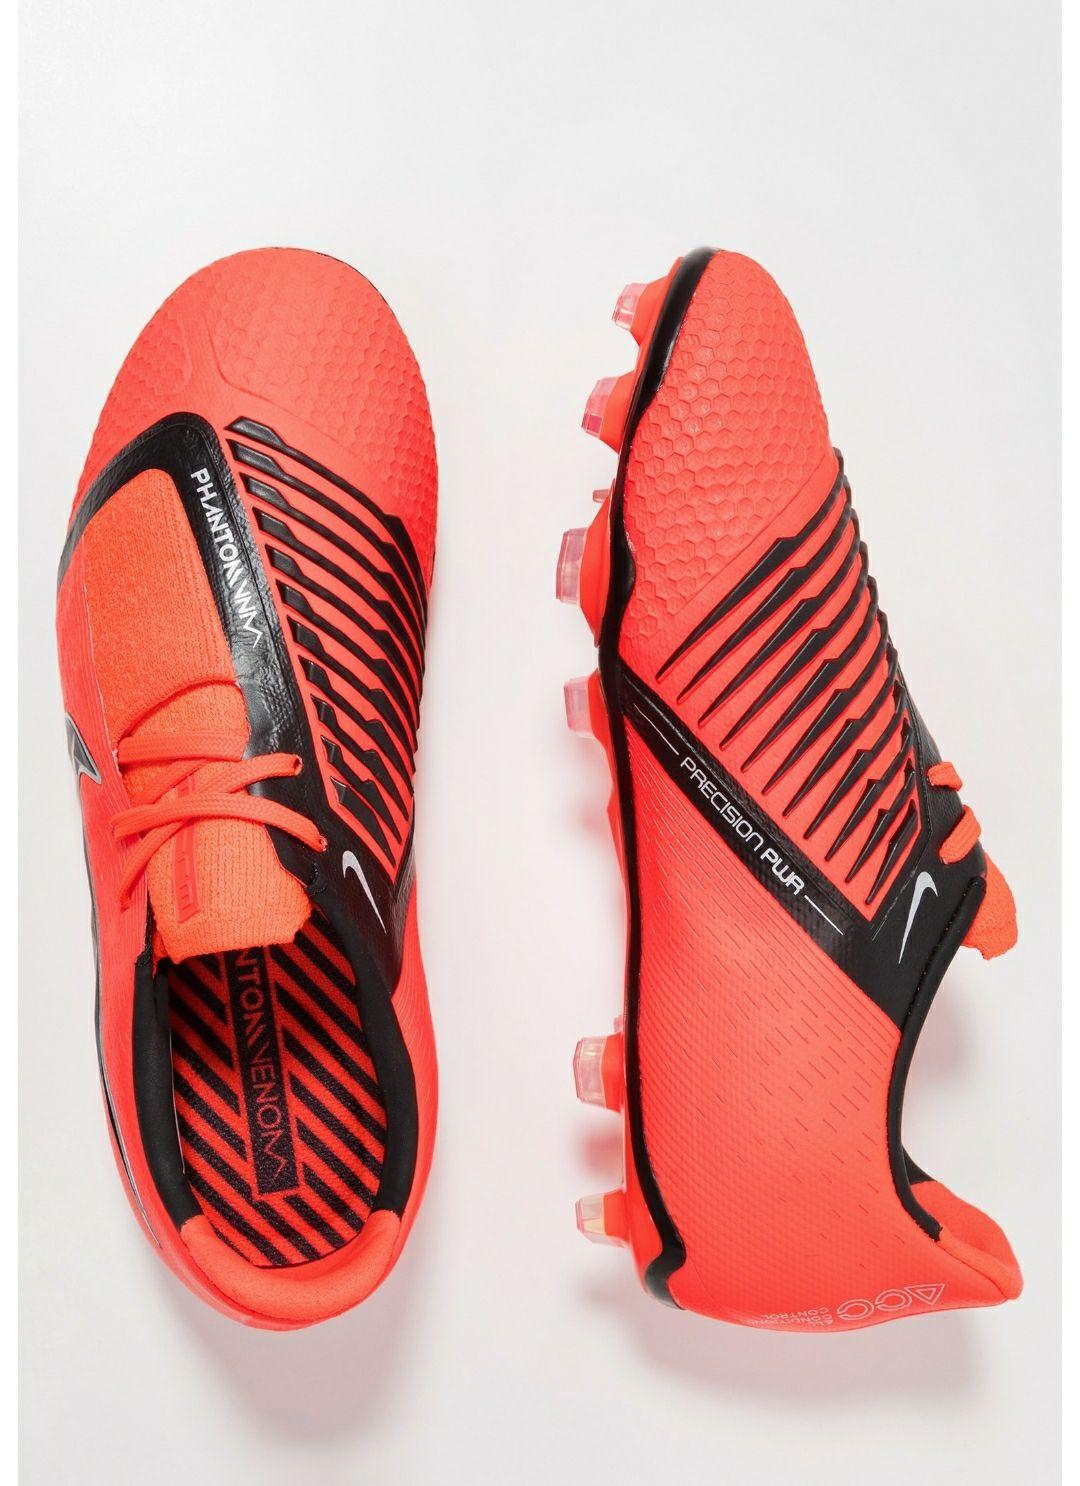 Nike voetbalschoen kids (Phantom Elite FG)